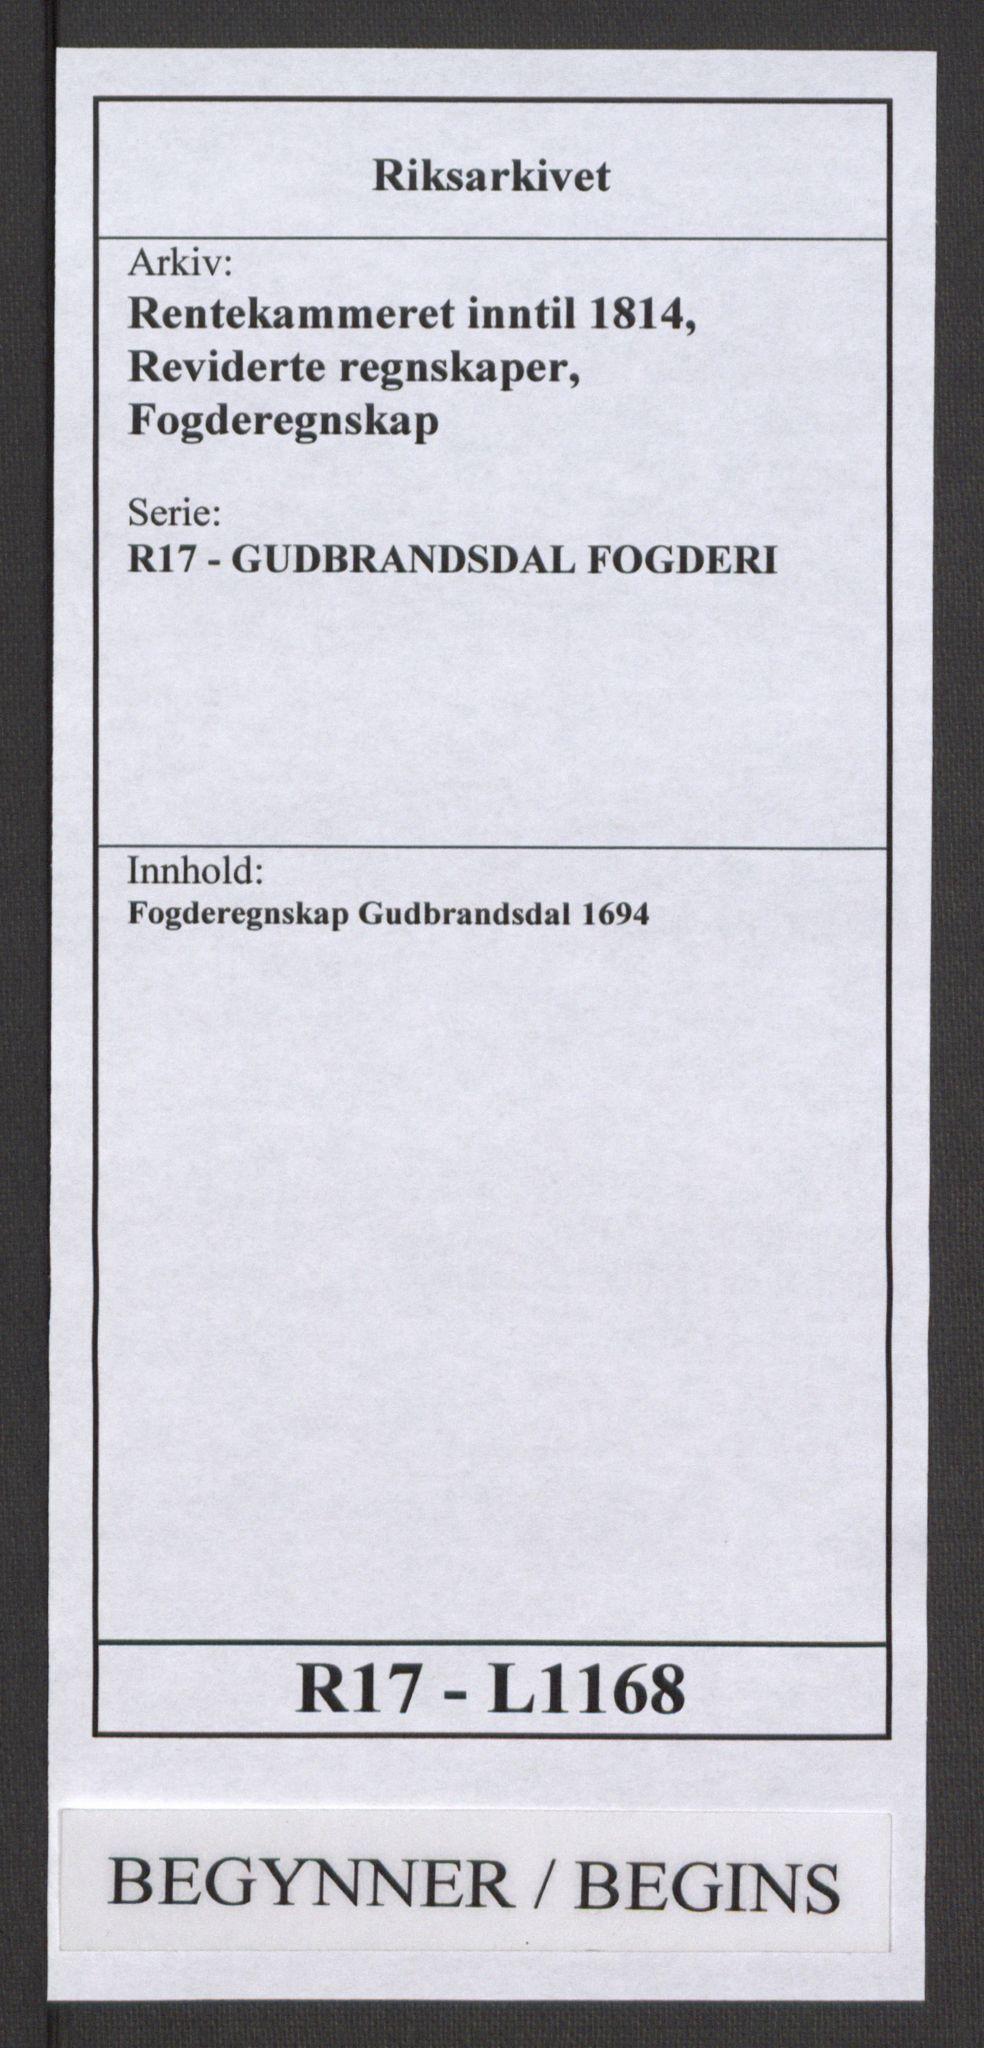 RA, Rentekammeret inntil 1814, Reviderte regnskaper, Fogderegnskap, R17/L1168: Fogderegnskap Gudbrandsdal, 1694, s. 1